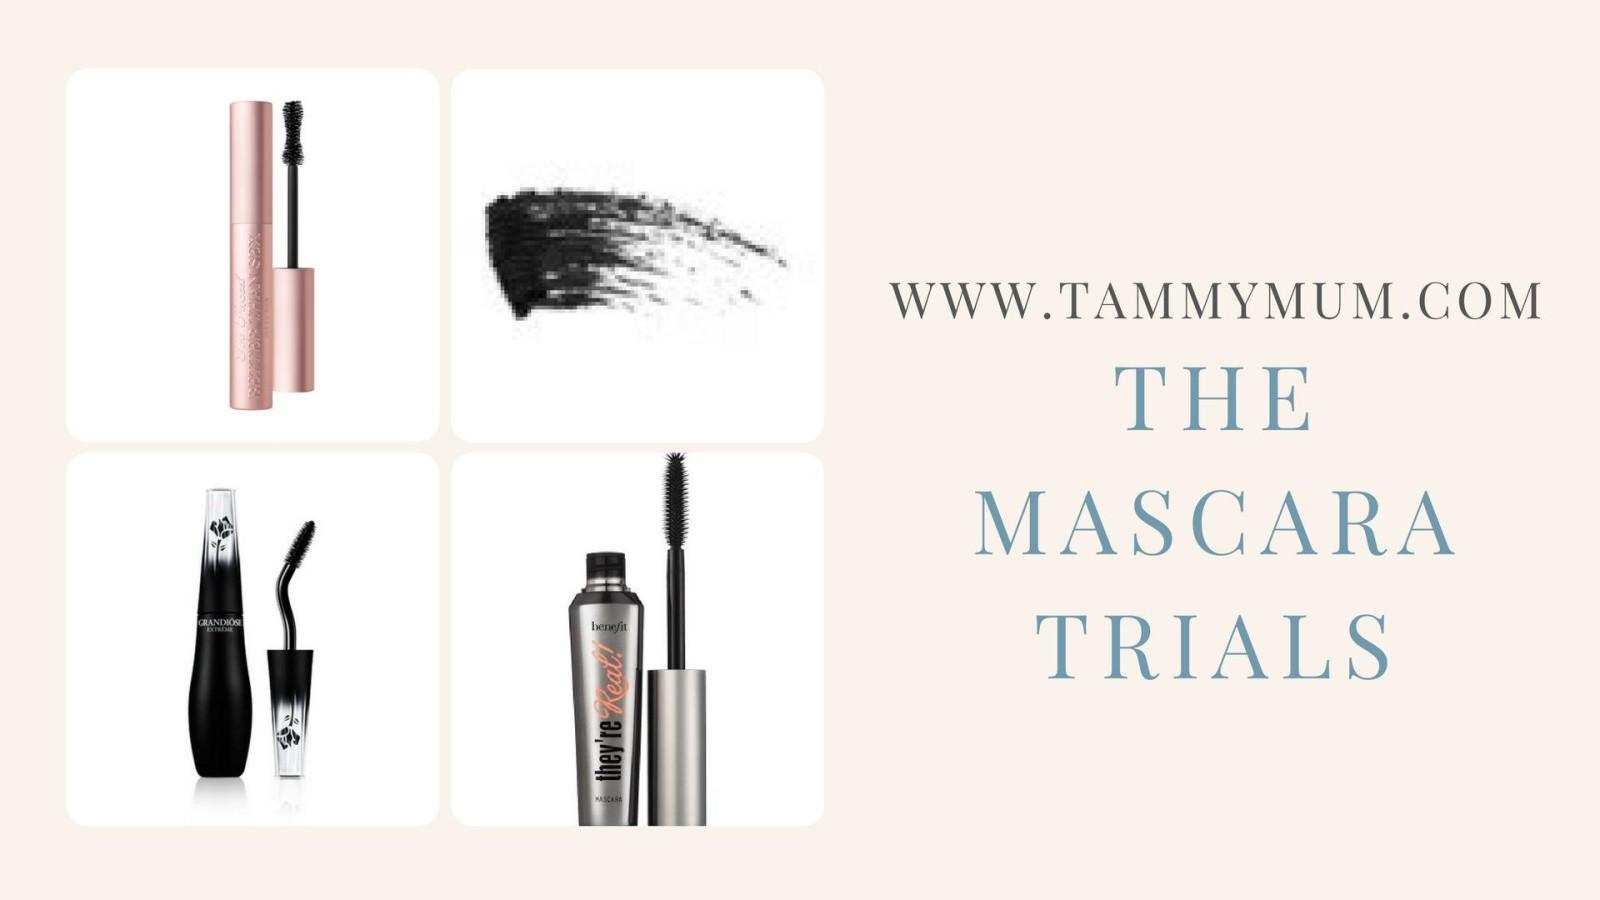 The Mascara Trials